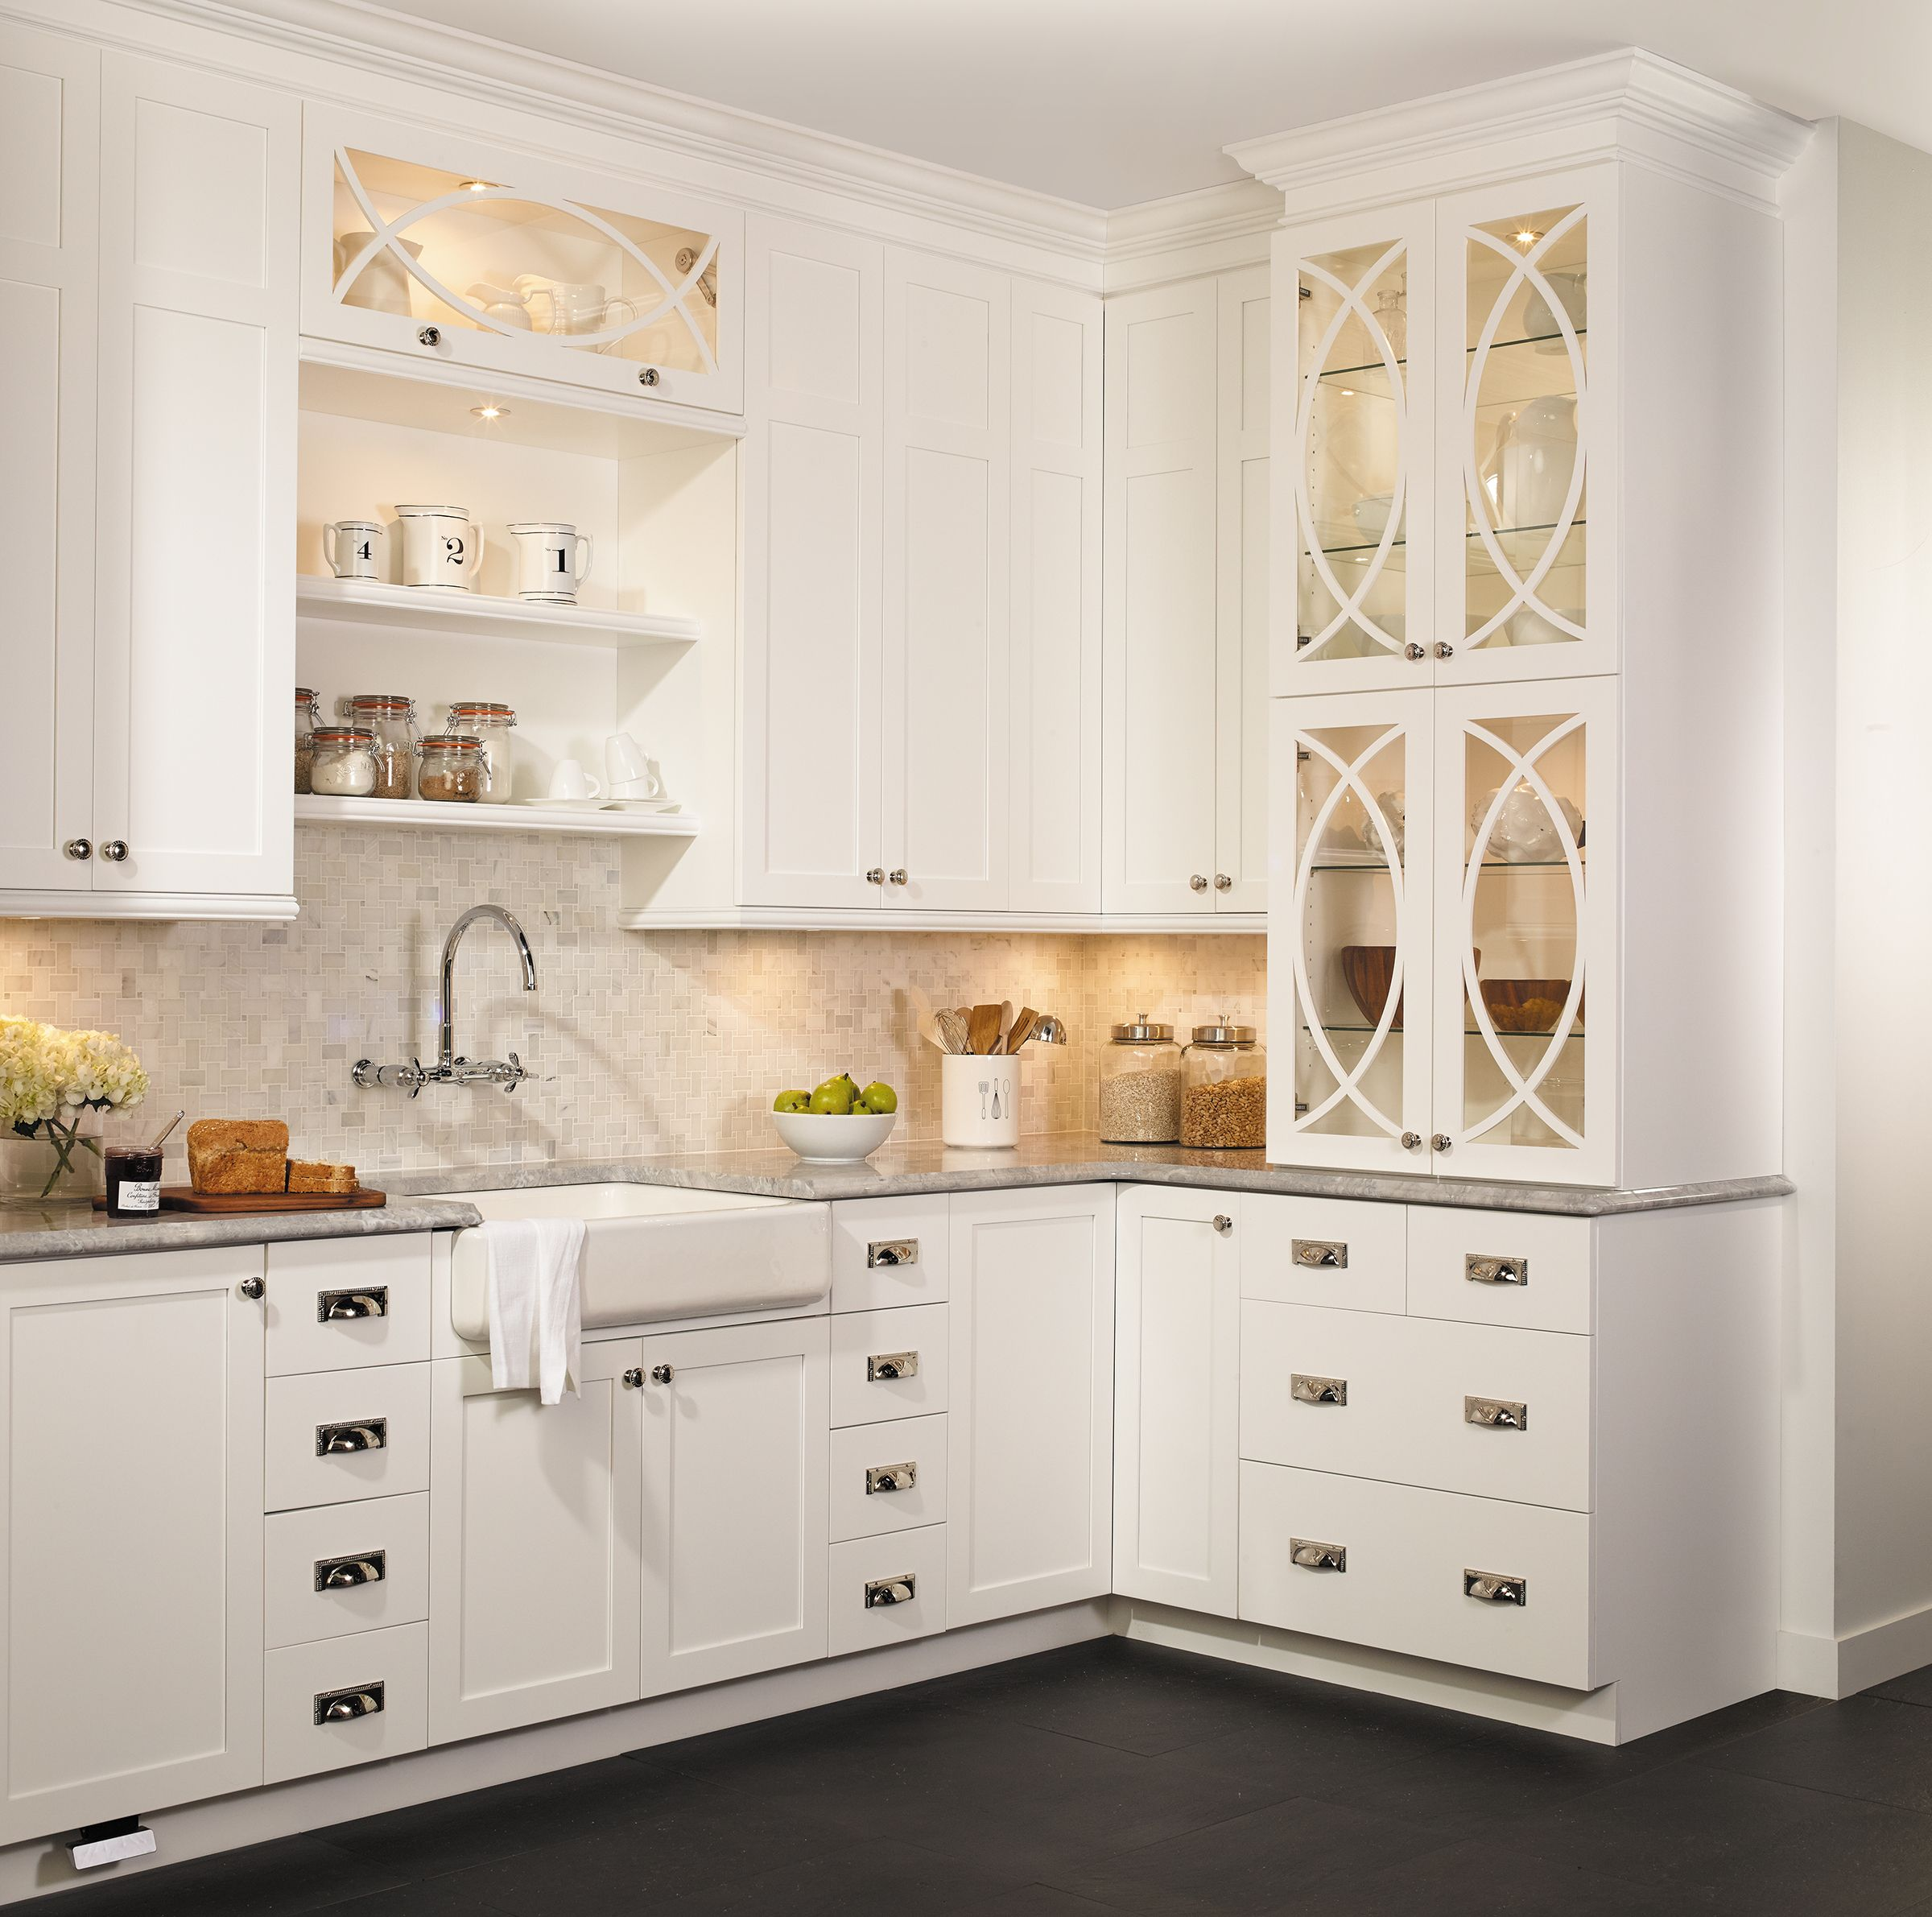 Cabico Boutique Retro Kitchen White Kitchen Design Kitchen Cabinet Remodel Country Kitchen Designs